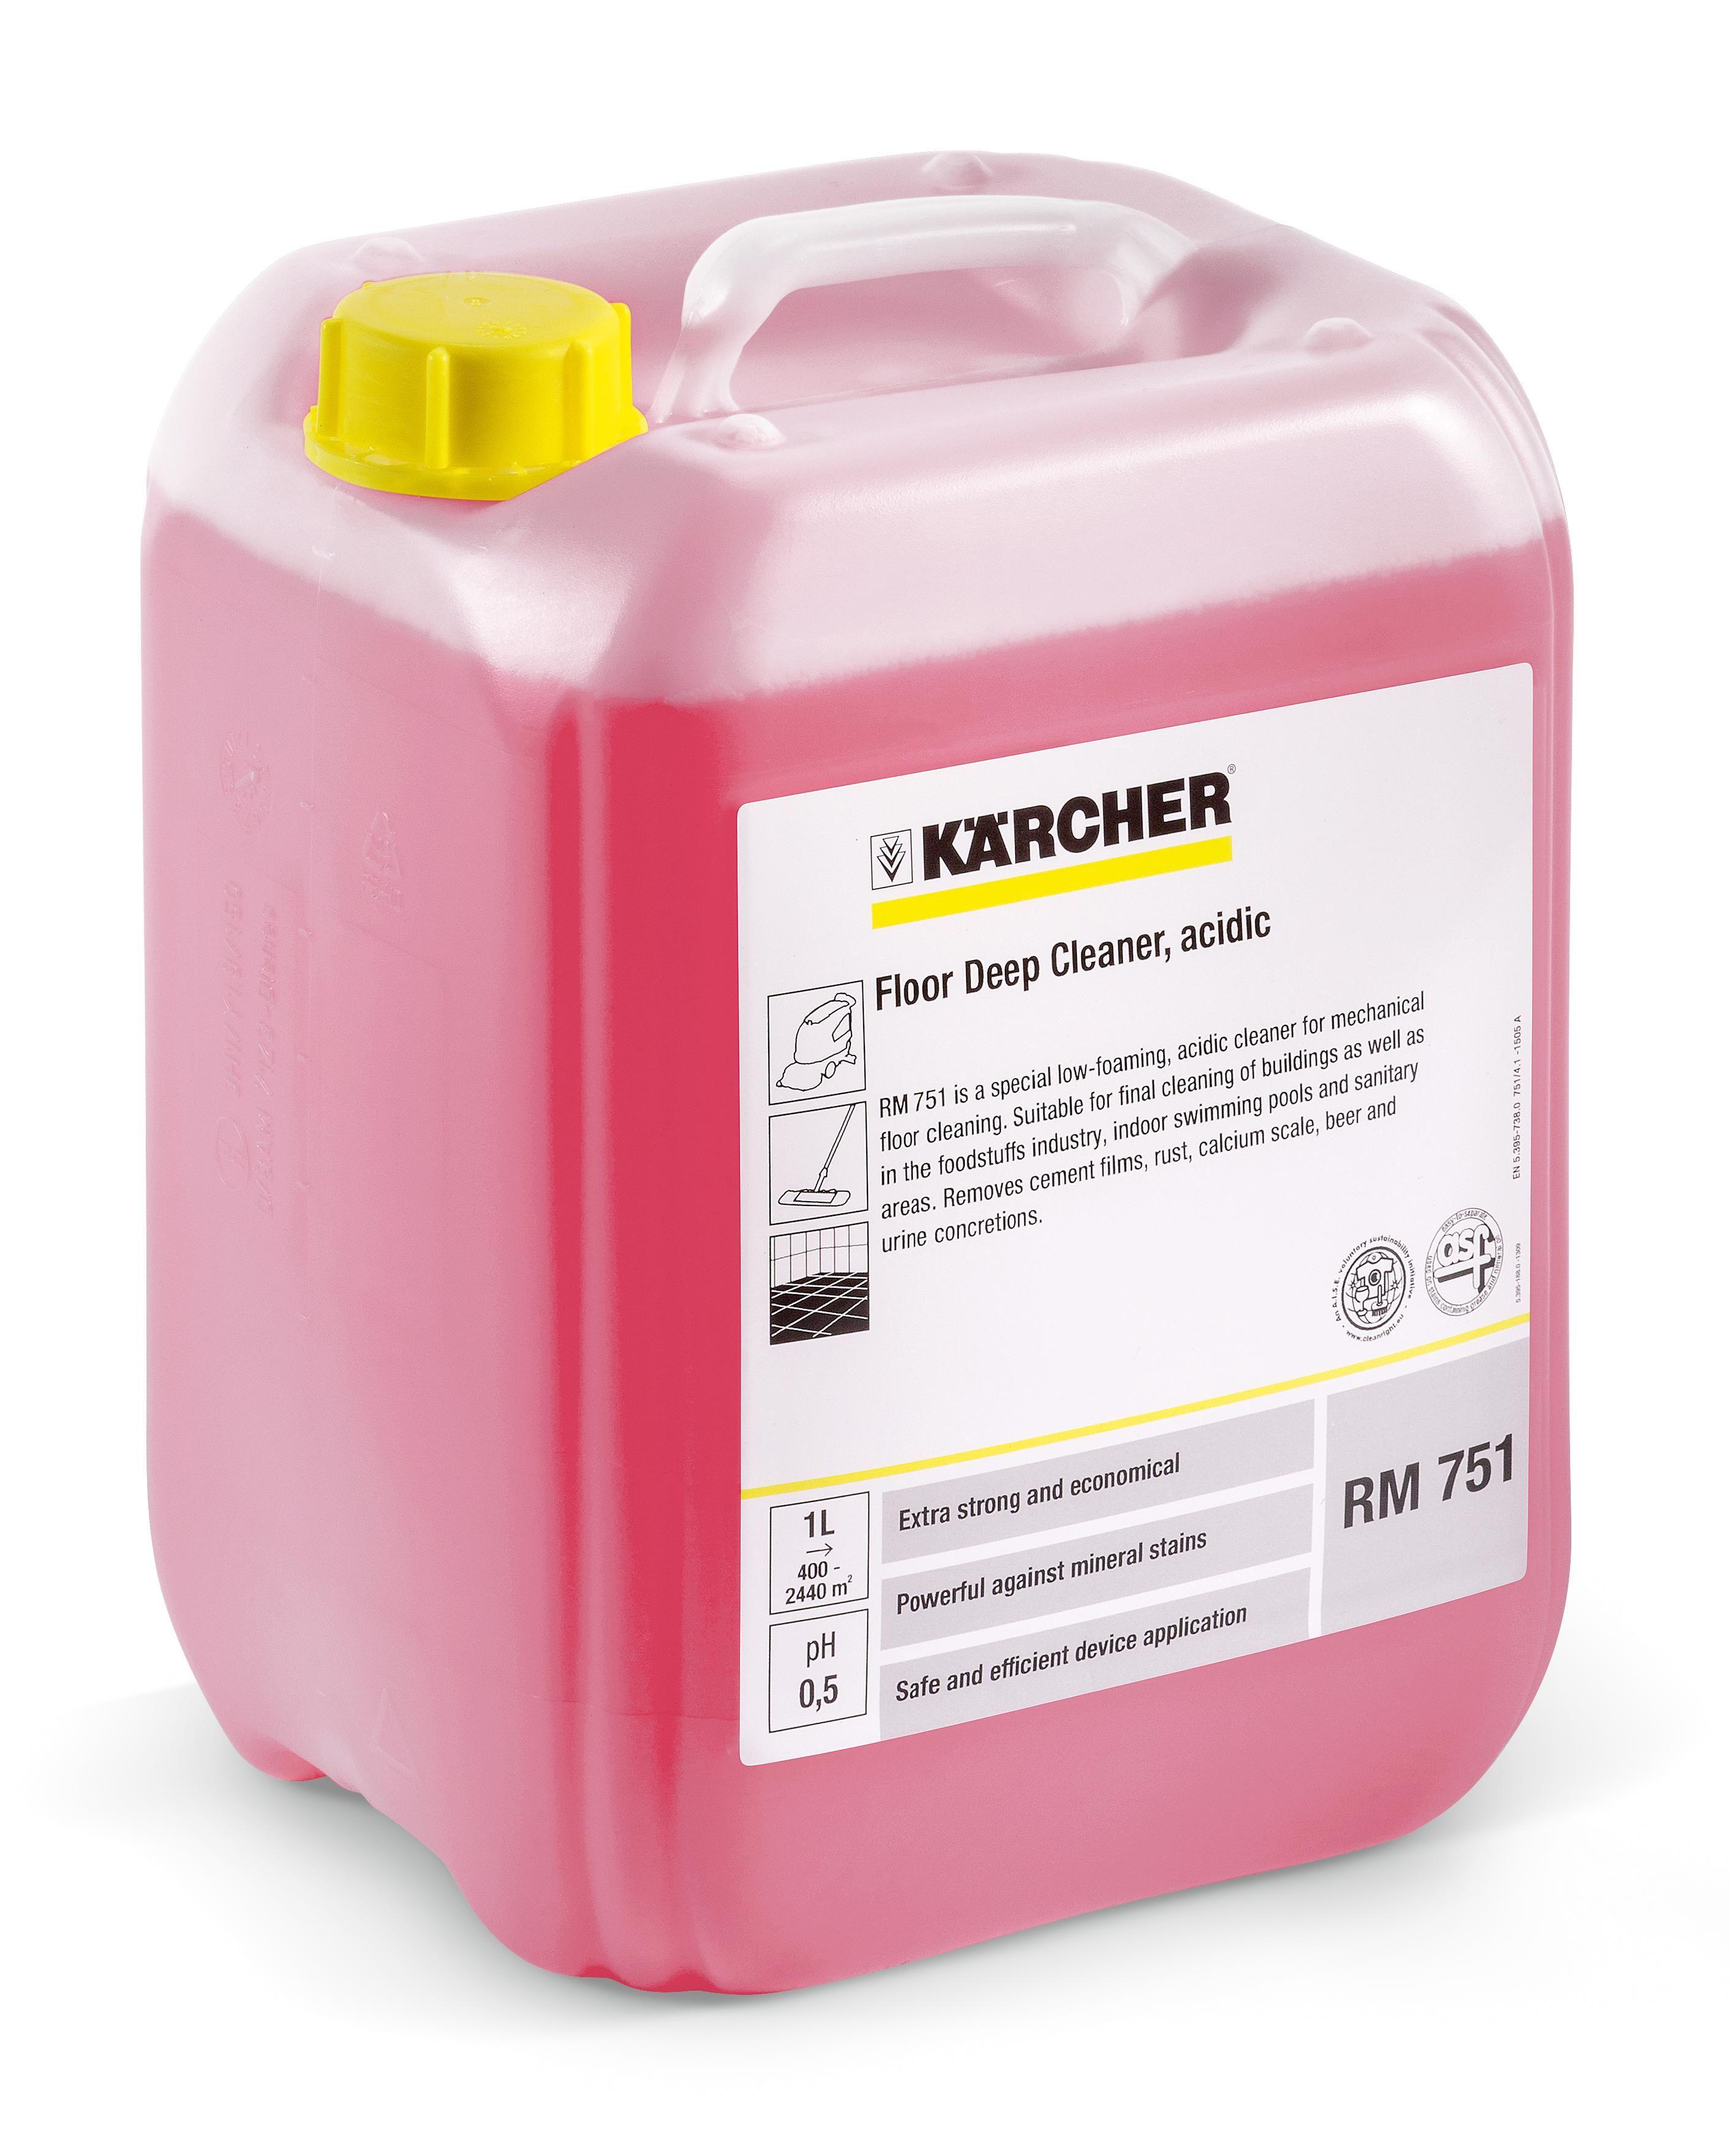 Kärcher Rengjøring RM 751 10L (flaske med 10 l) 6.295-129.0